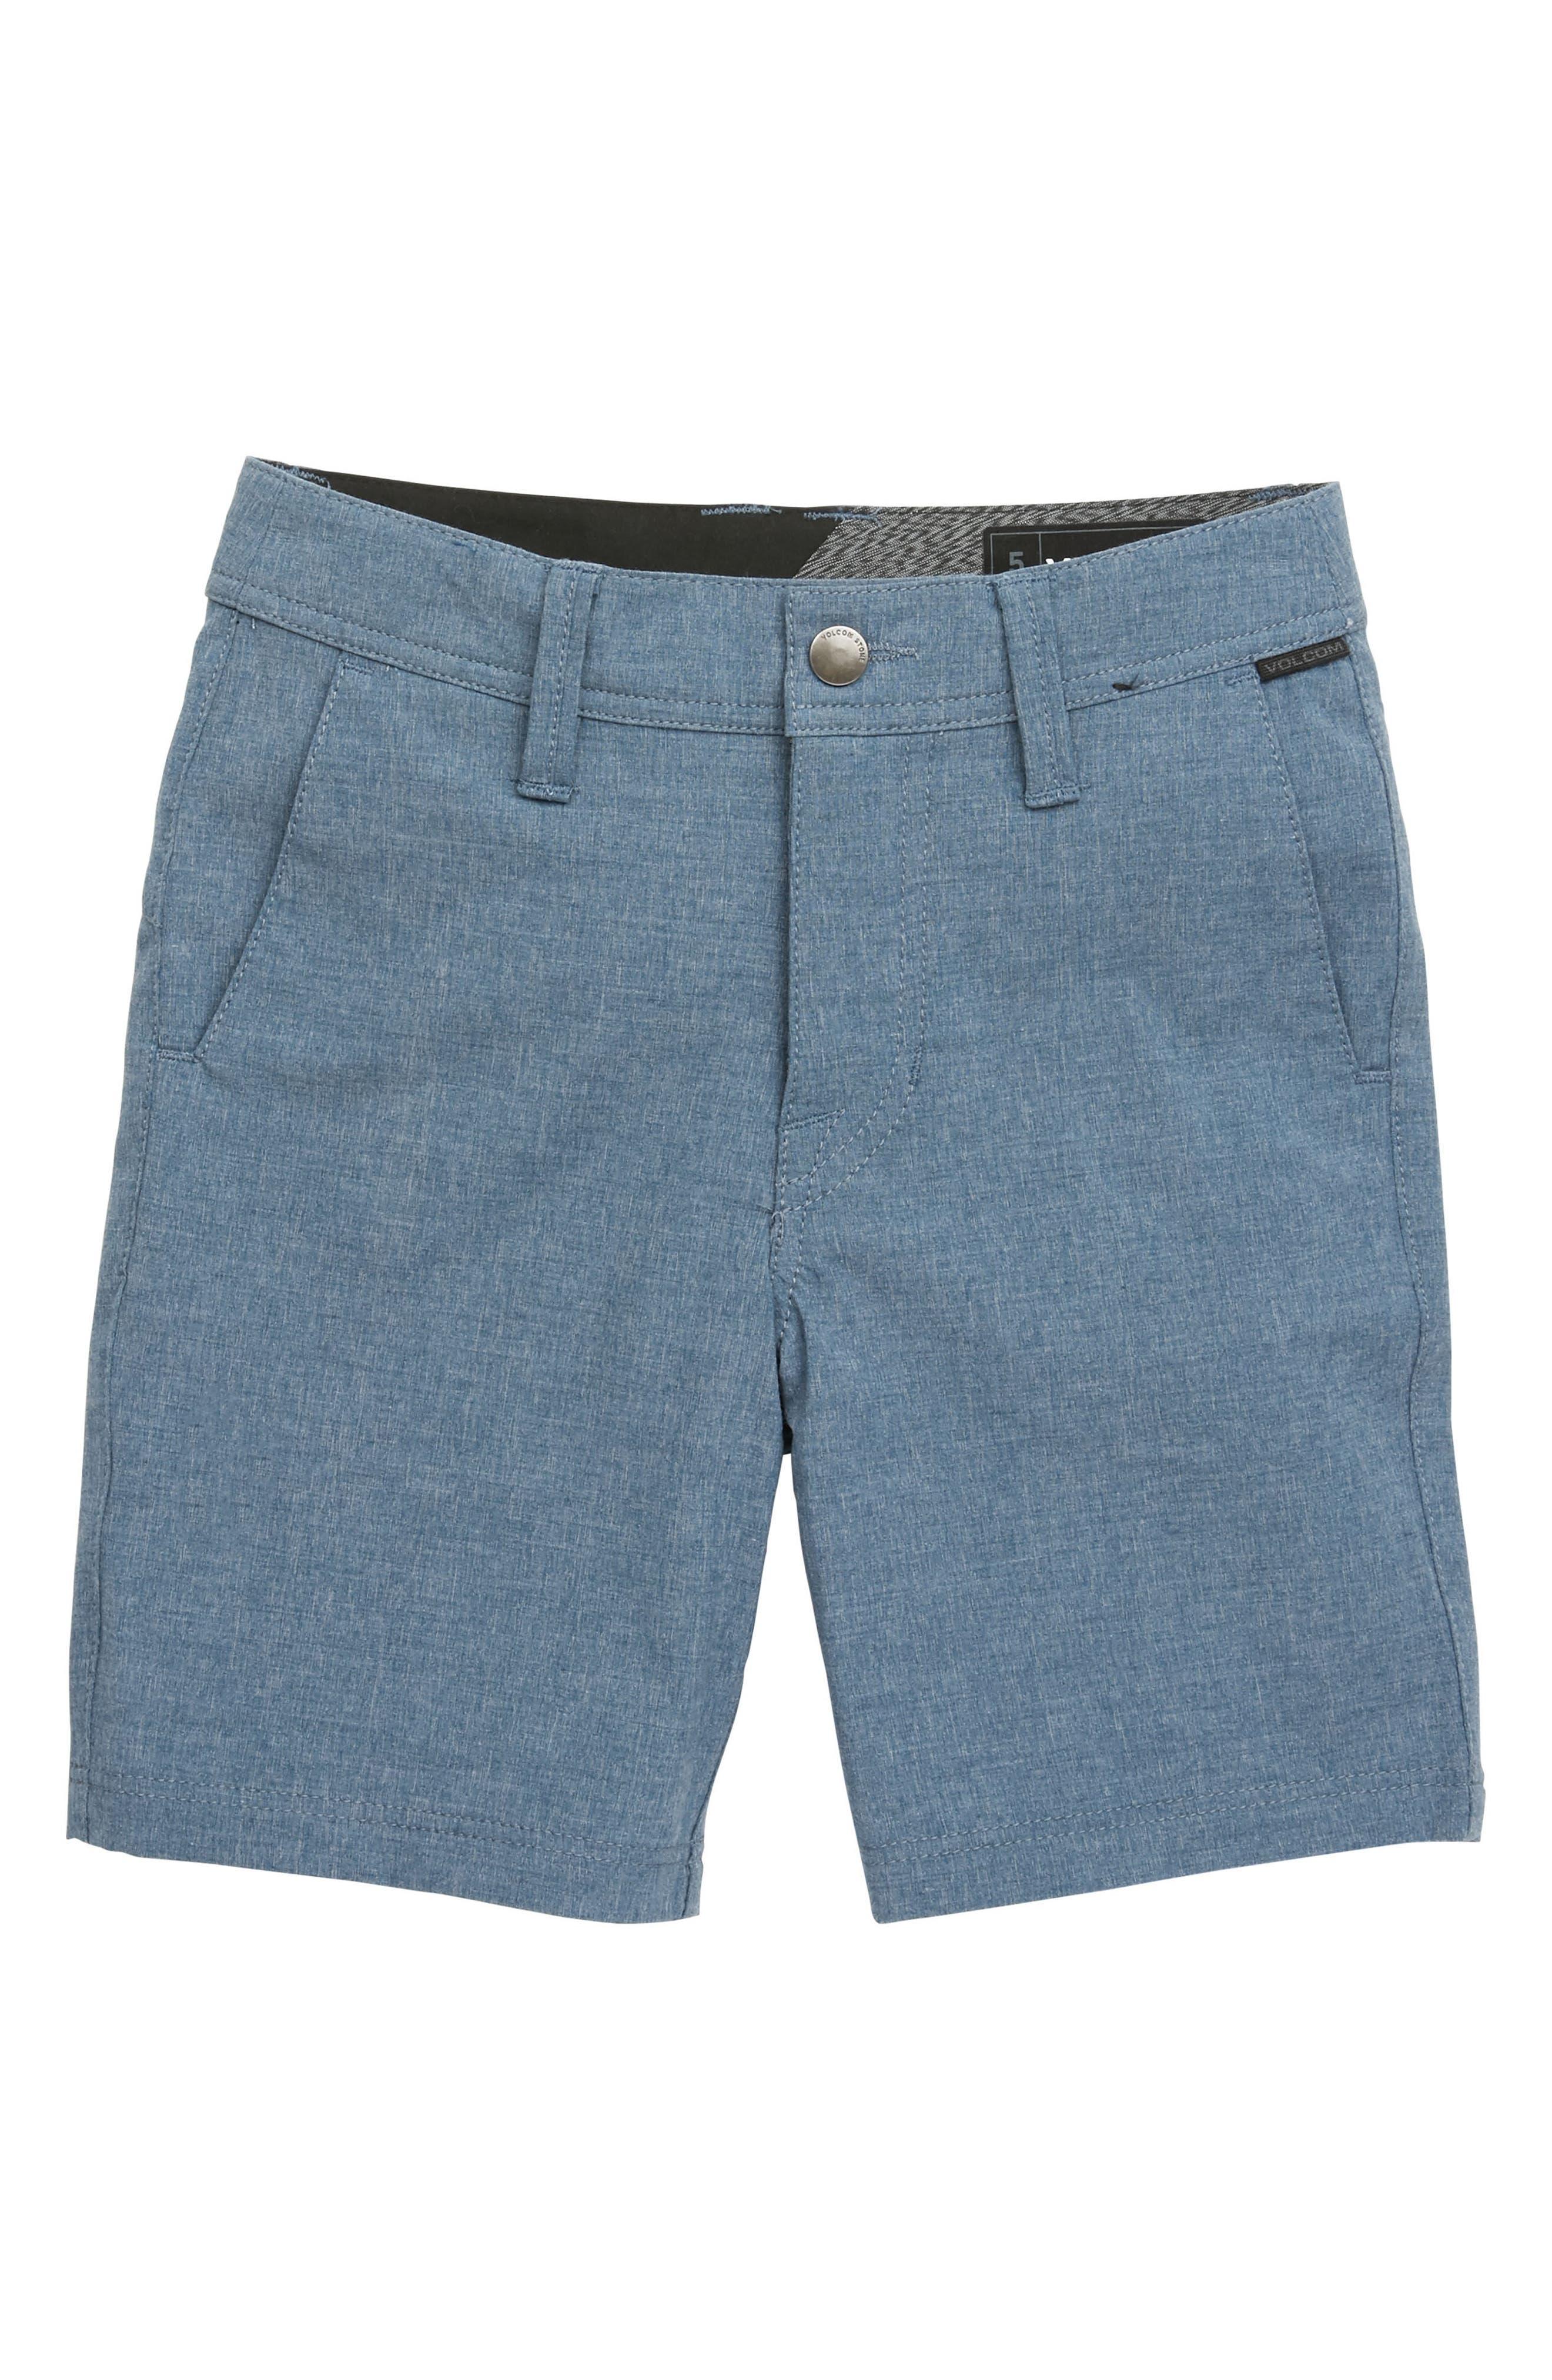 Surf N' Turf Static Hybrid Shorts,                         Main,                         color, Deep Blue